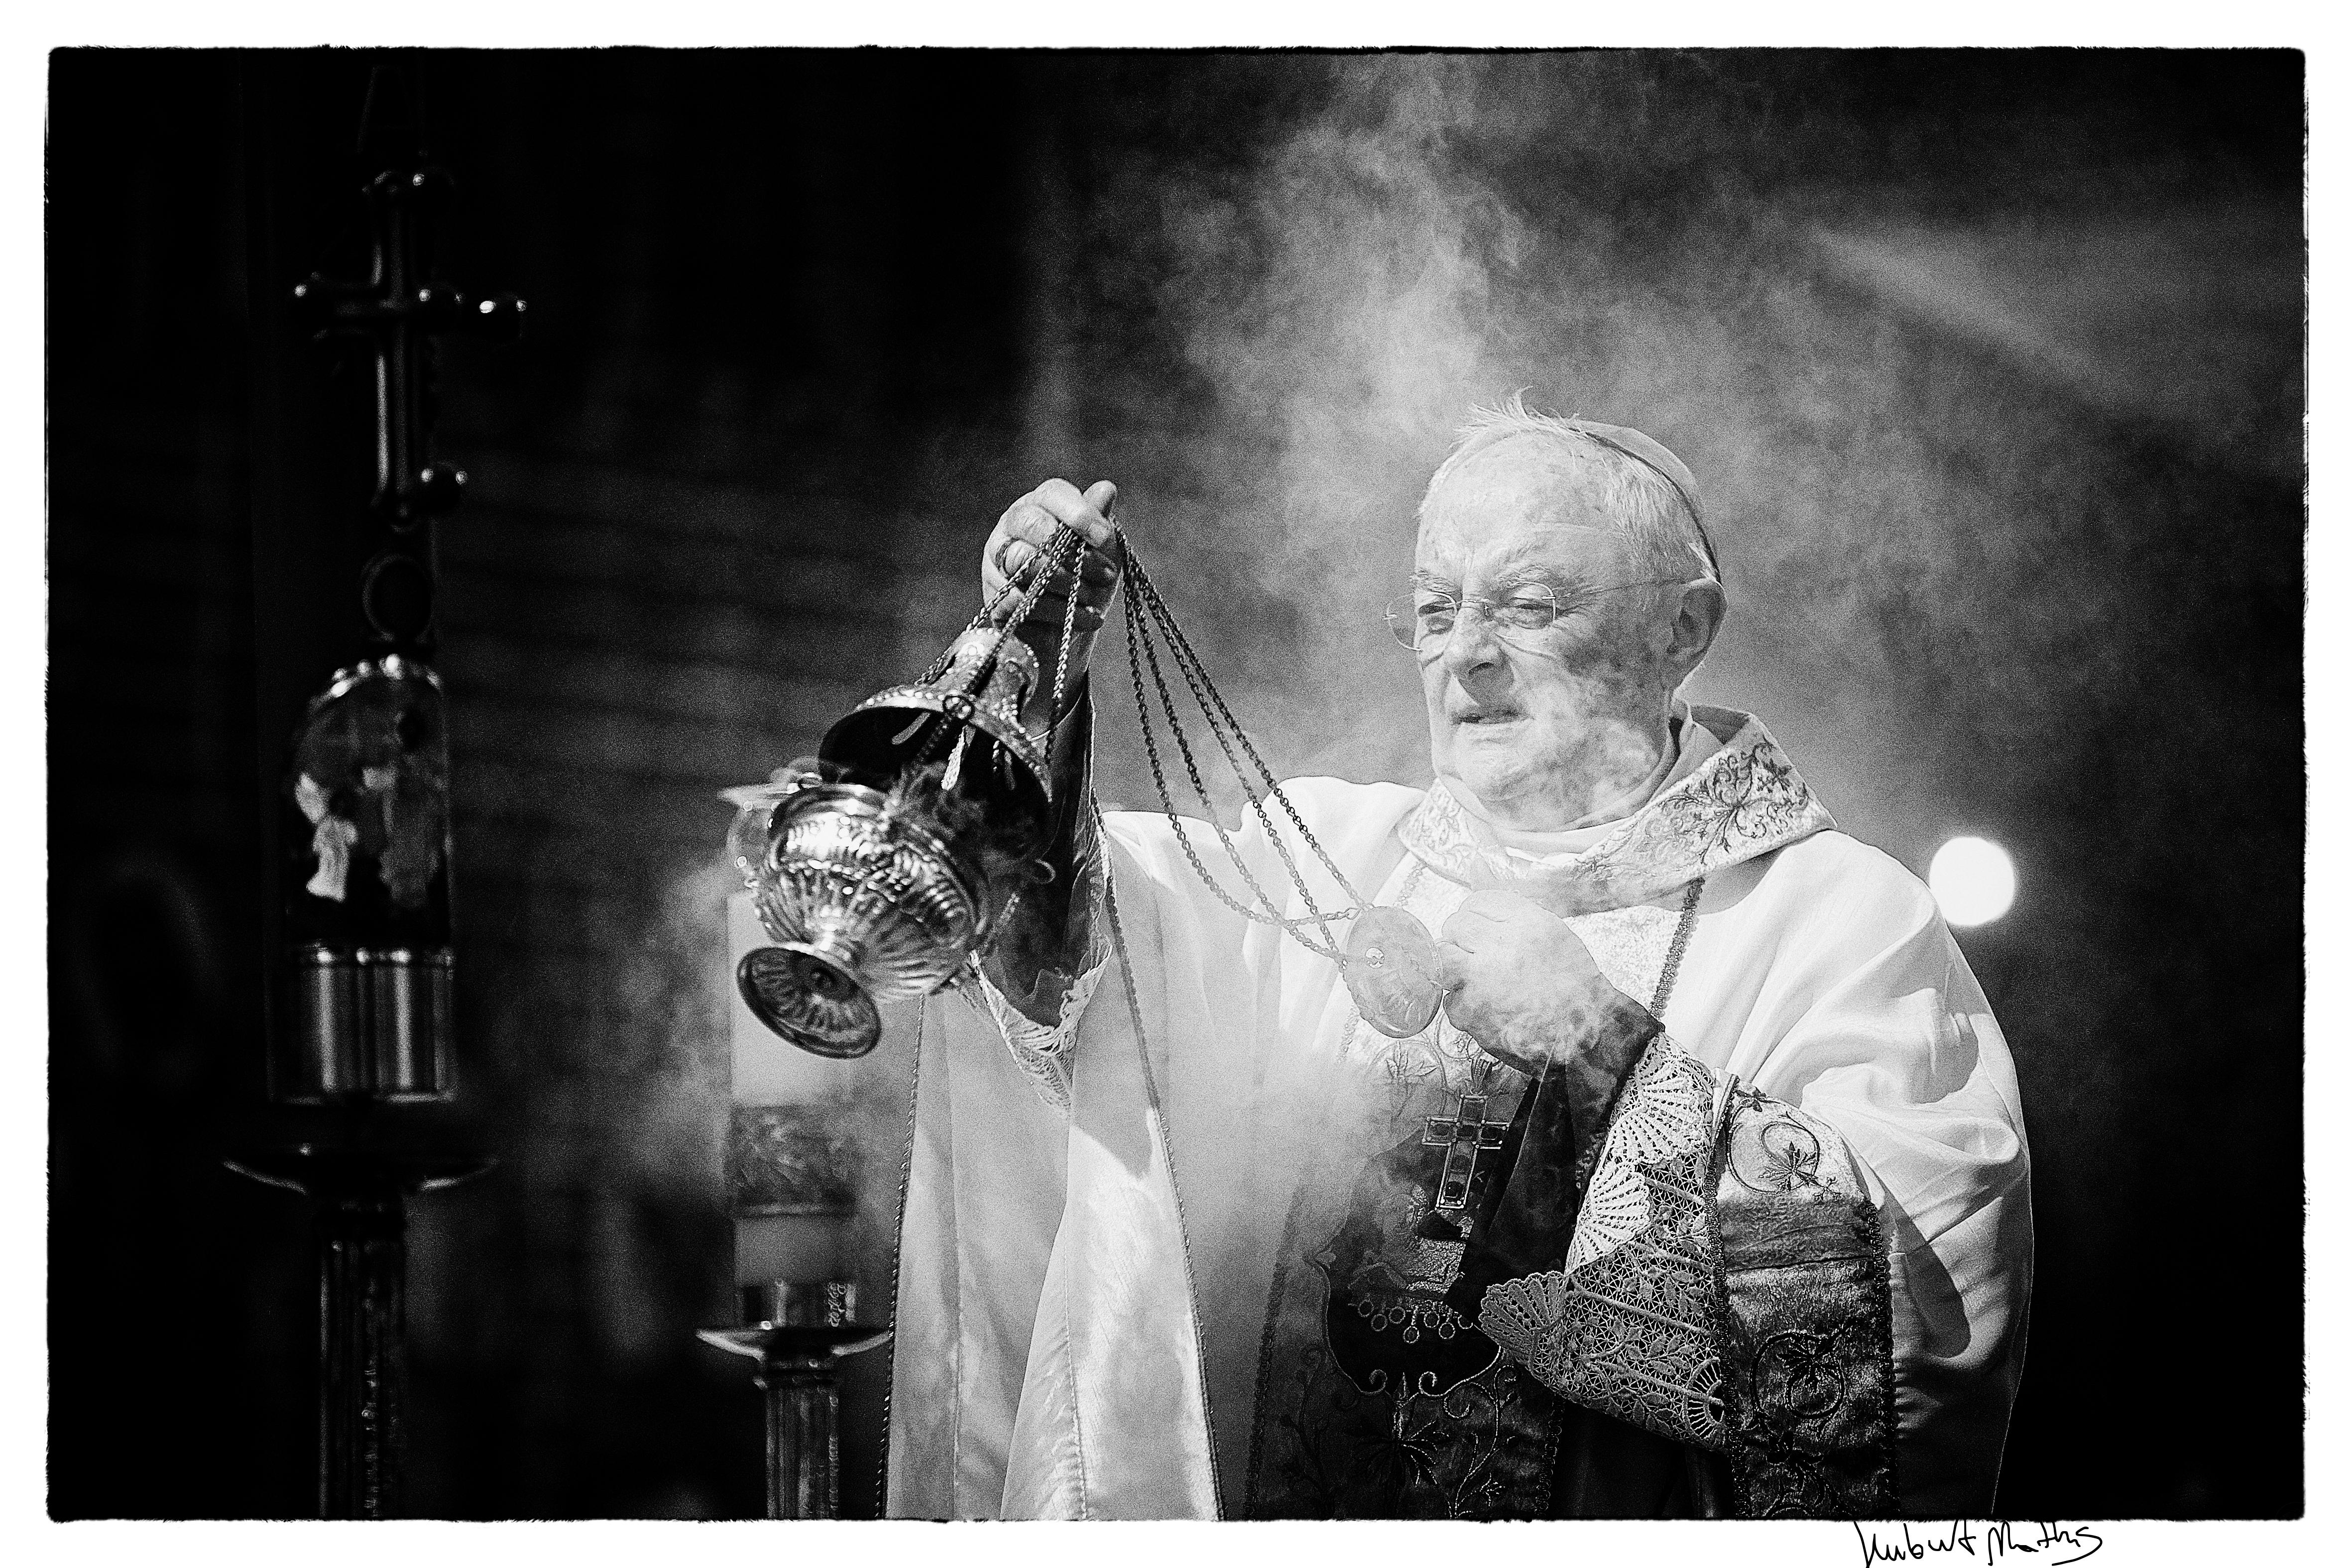 Abp. Henryk Hoser